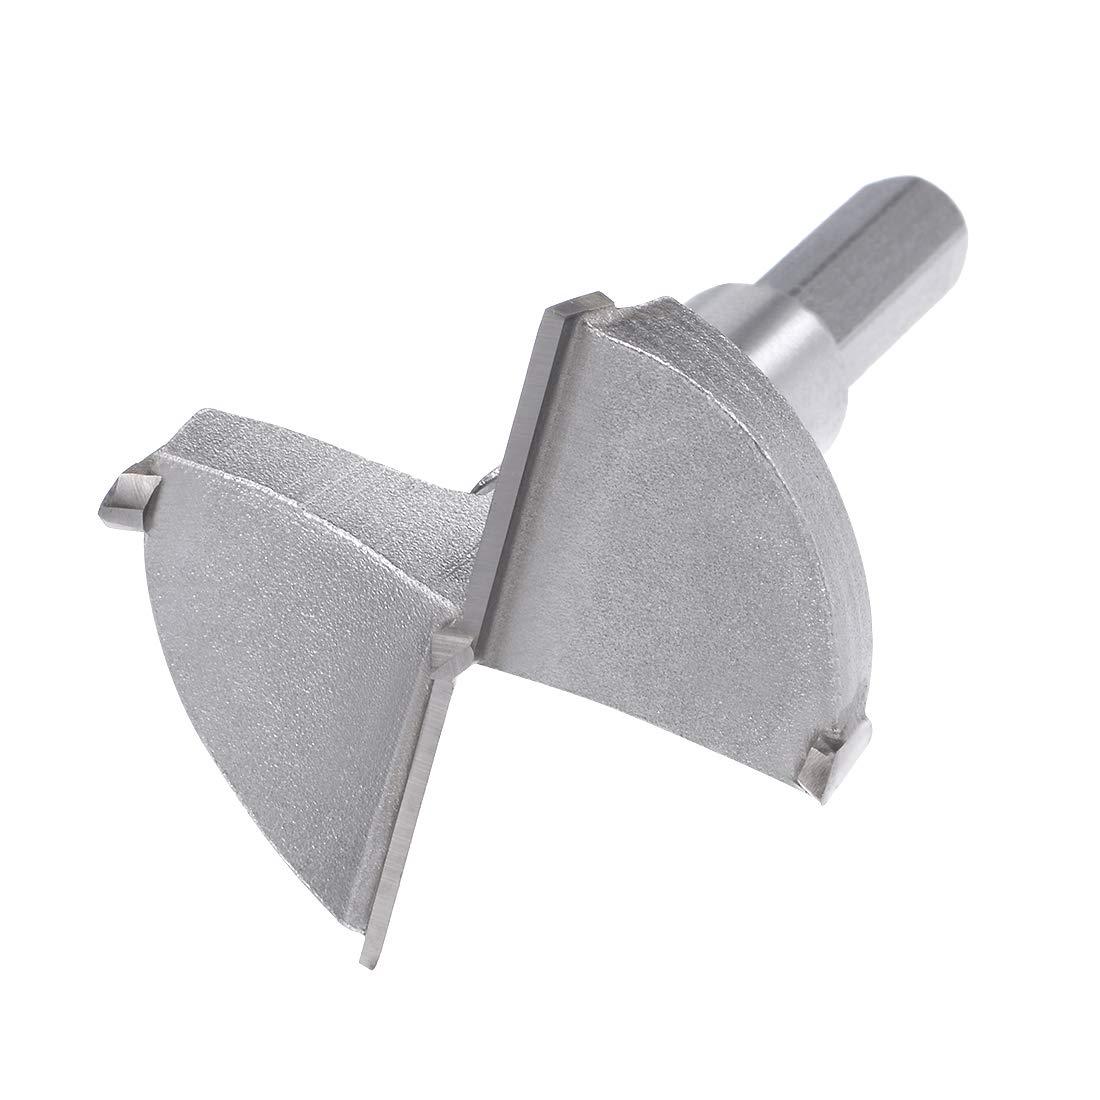 95mm Diameter,12mm Shank uxcell Hinge Boring Forstner Drill Bit